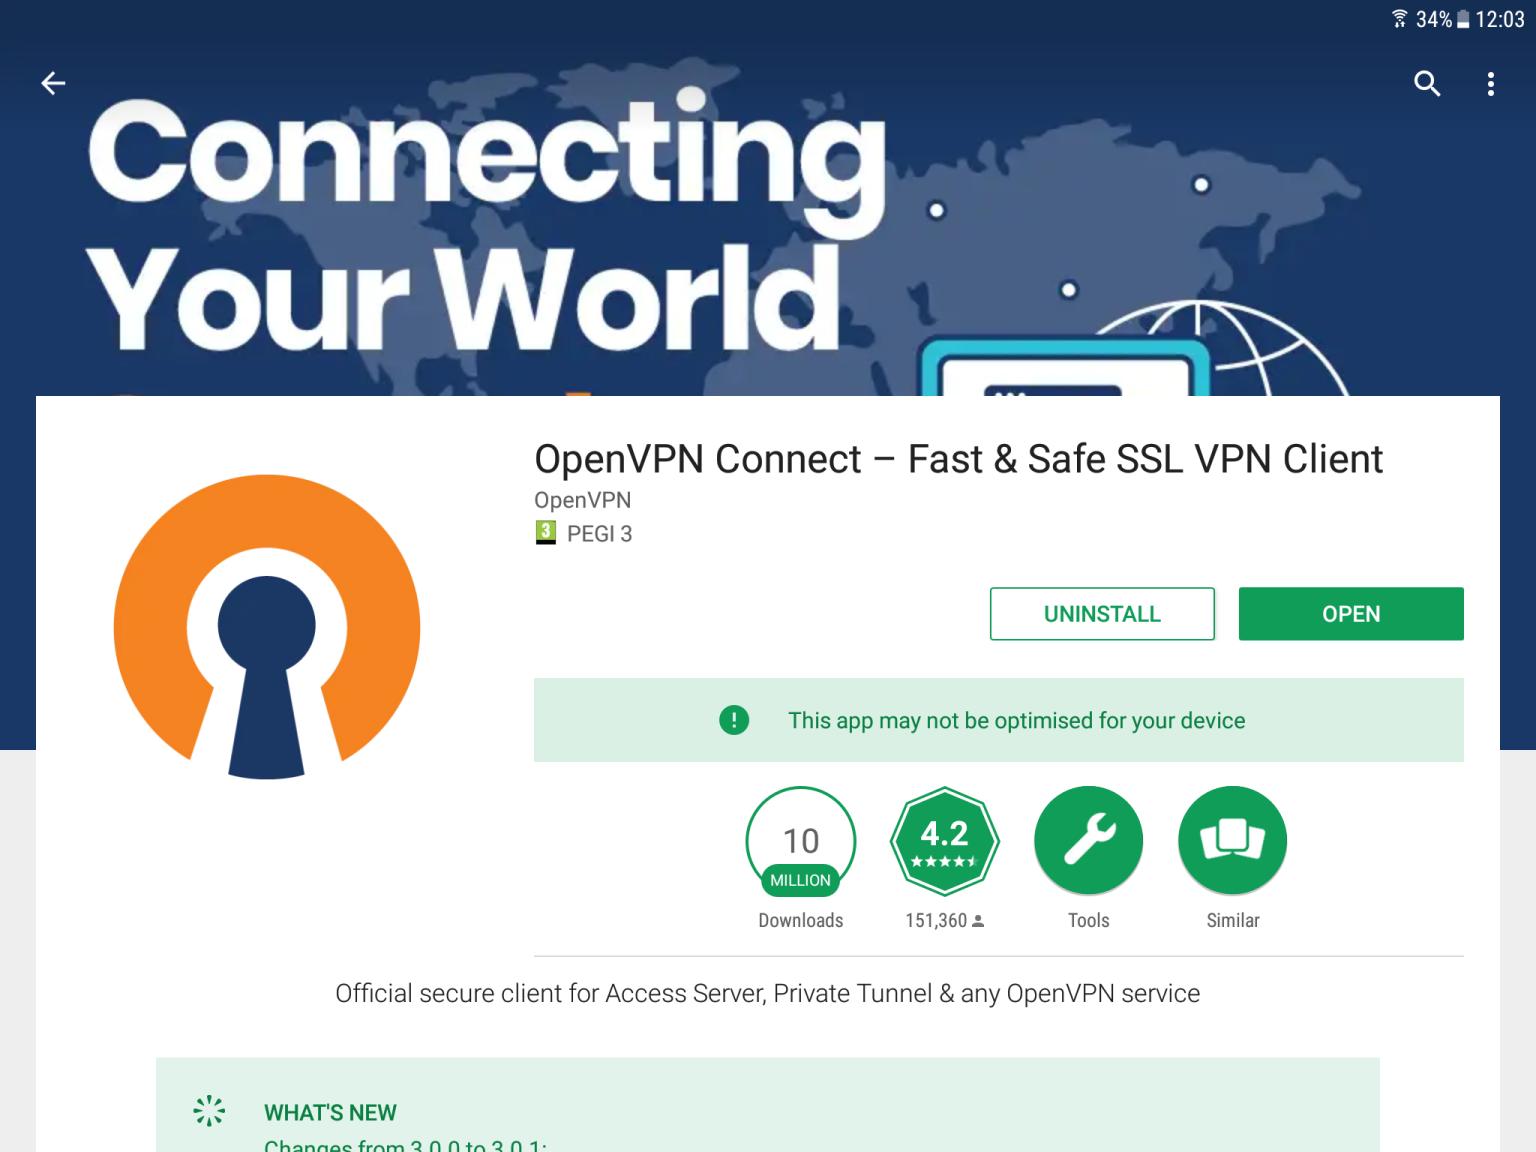 OpenVPN Connect – Fast & Safe SSL VPN Client